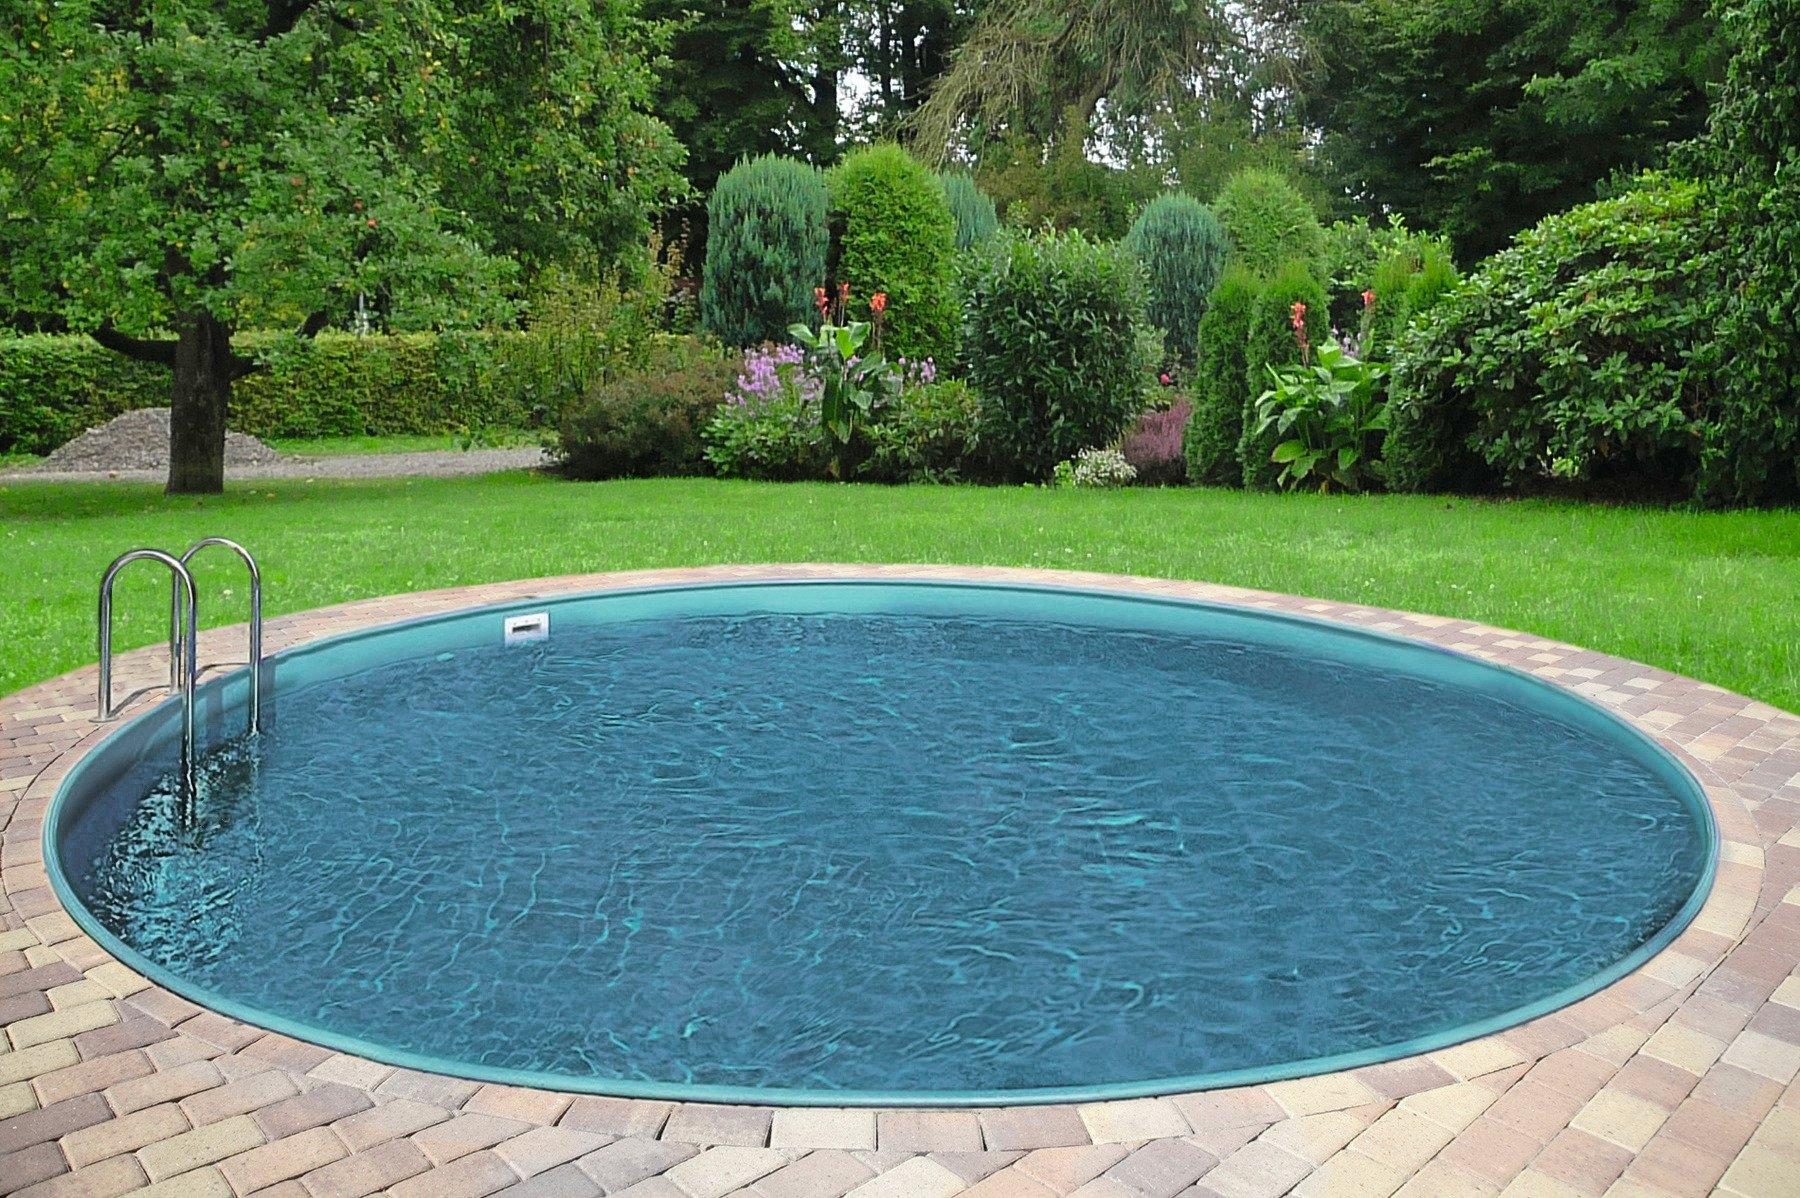 9a6bf1562f72f2 6-delig, INTEX Whirlpool-set PureSpa Bubble Therapy Round, CLEAR POOL Ovaal  zwembad, SUMMER FUN Solardouche »Solardouche SilverDeLuxe«, 226 cm,  zilverkleur, ...